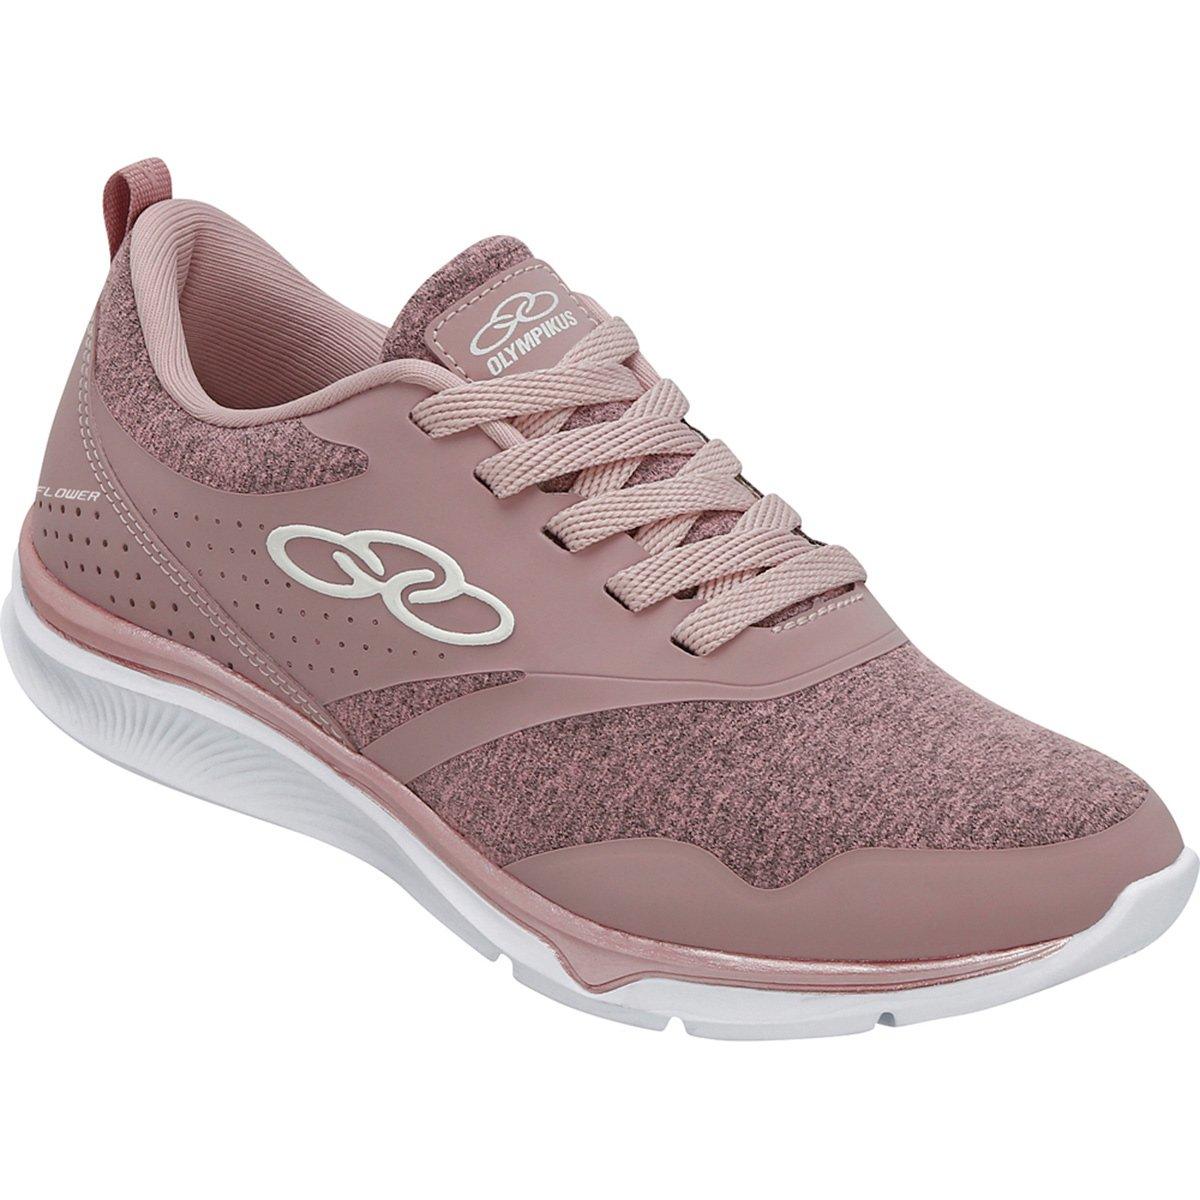 tenis mizuno feminino para caminhada netshoes 700